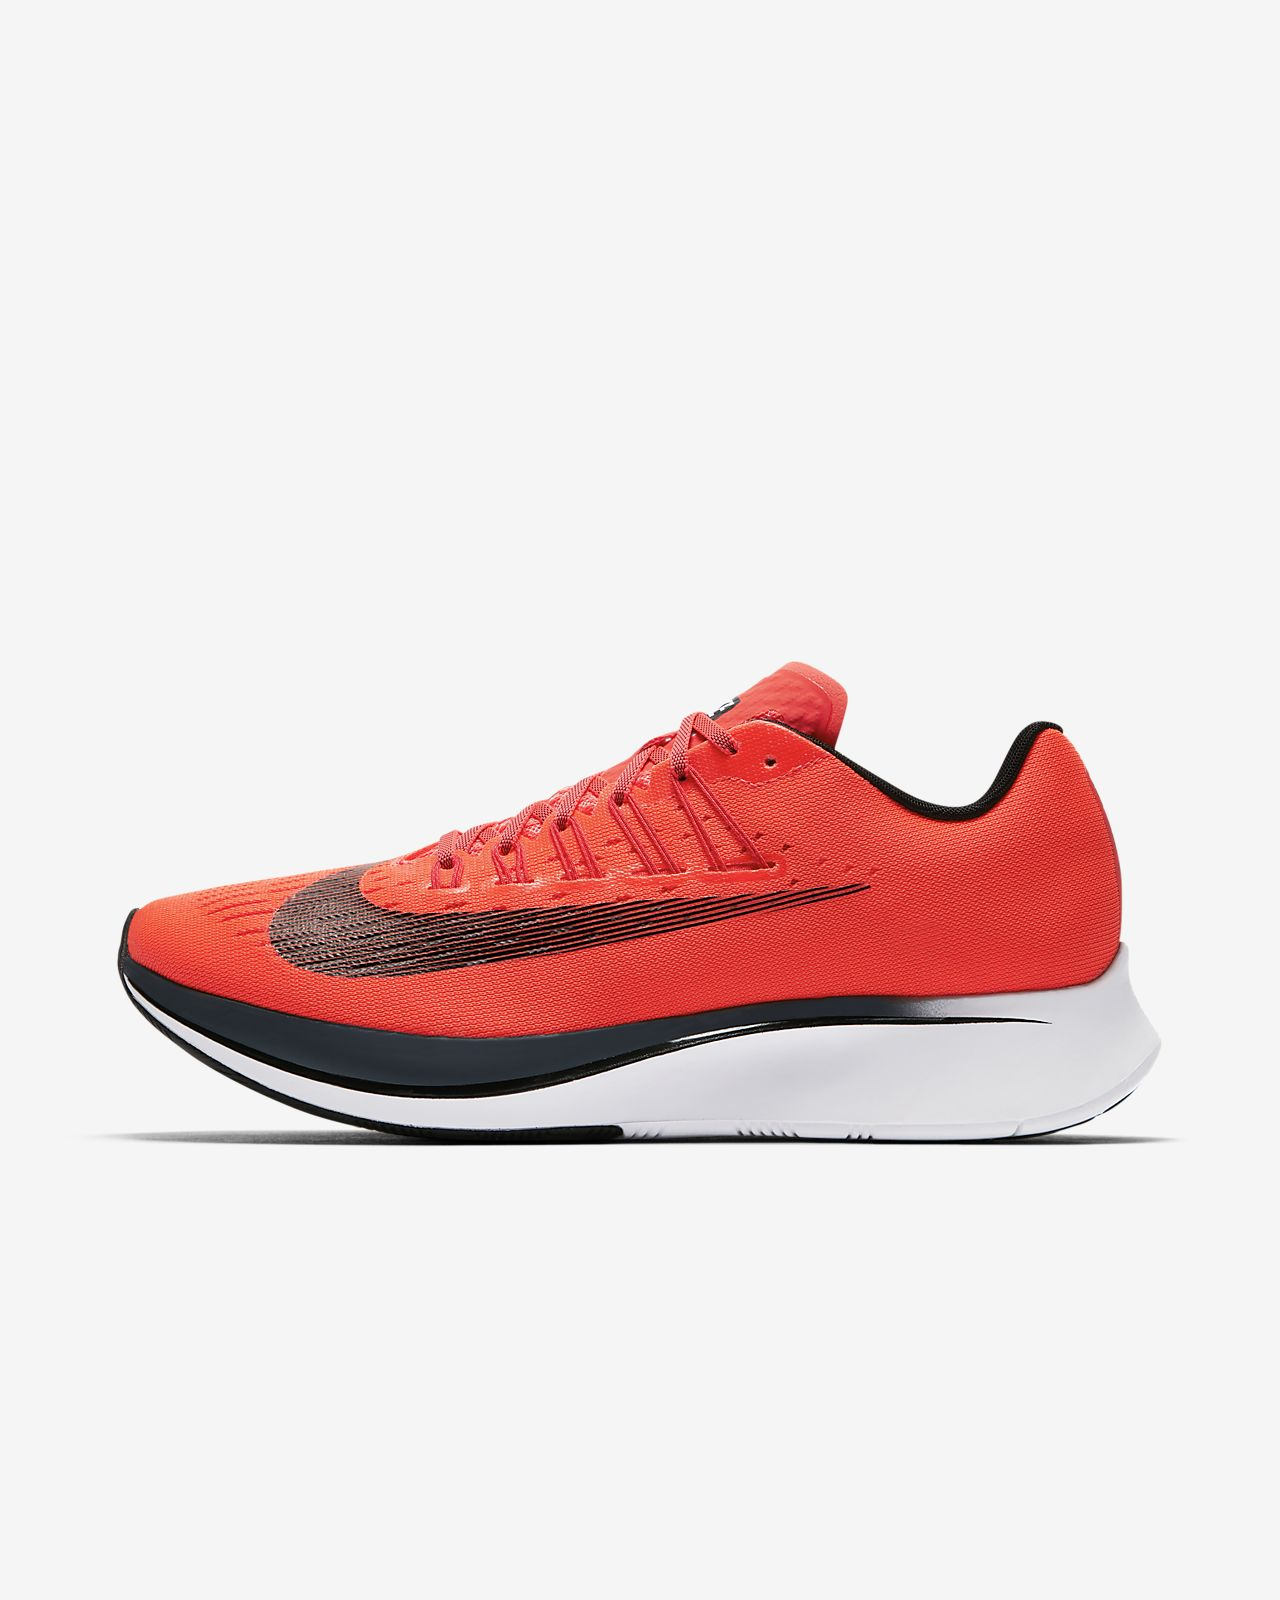 dc8d35c3 Мужские беговые кроссовки Nike Zoom Fly. Nike.com RU